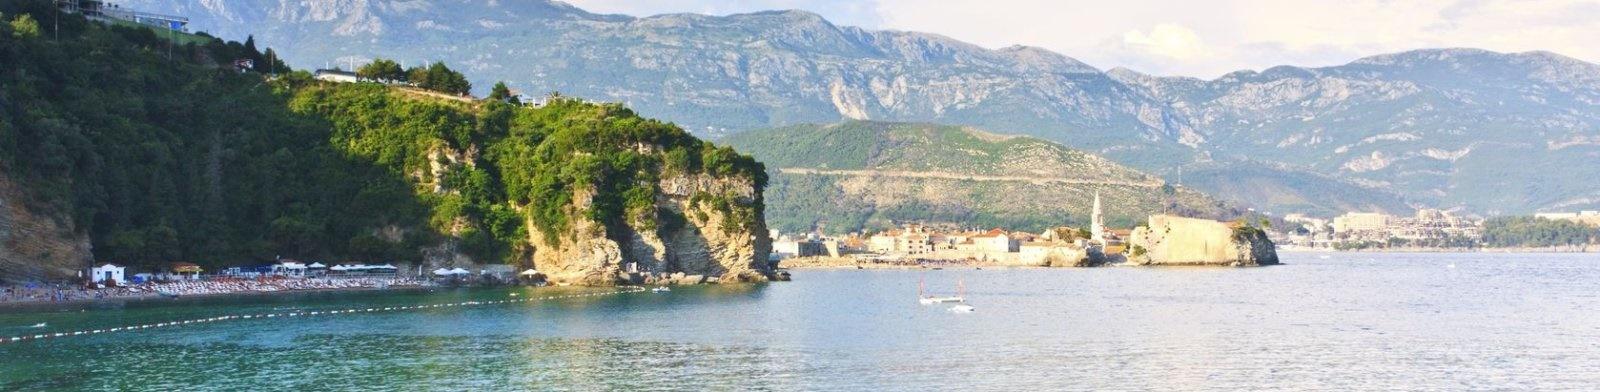 Luxury Montenegro Holidays